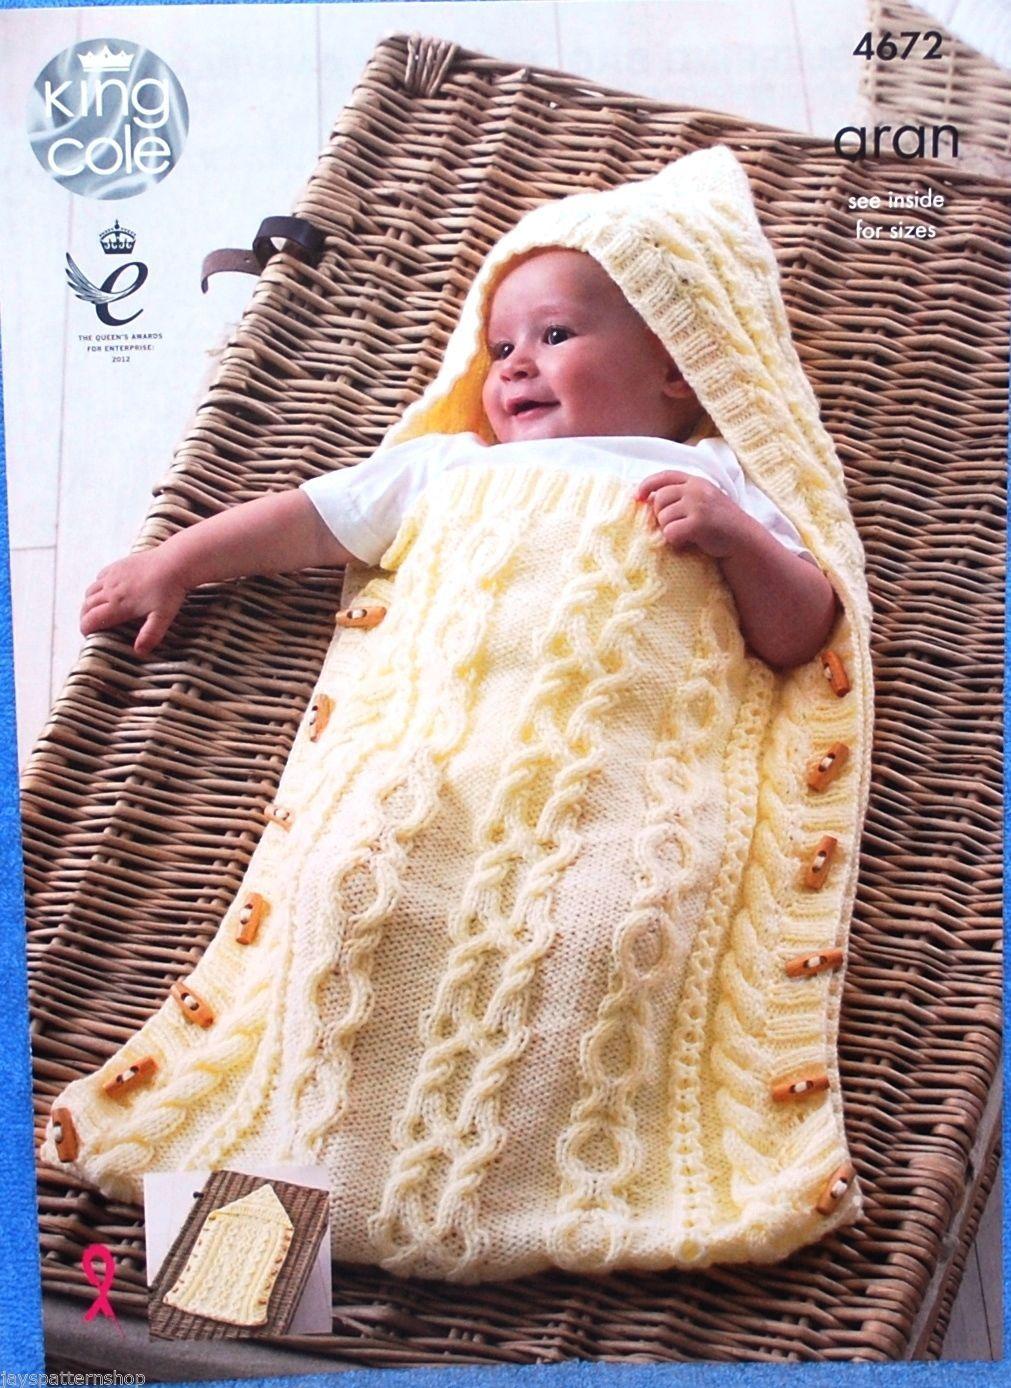 Babies childs aran knit sleeping bag cushion blanket knitting baby sleeping bag snuggler blanket aran knitting pattern king cole 4672 bankloansurffo Choice Image